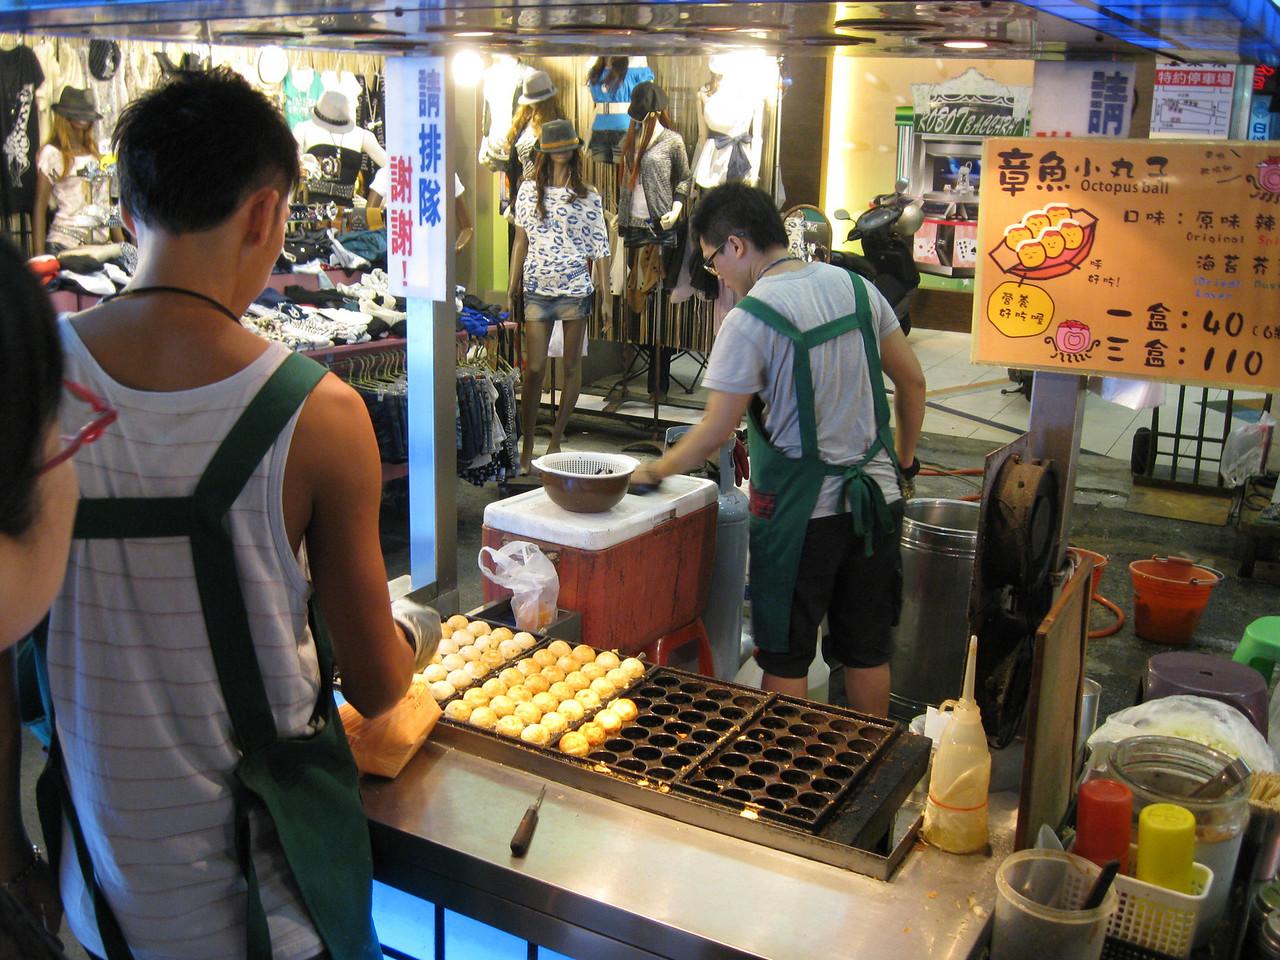 Octopus balls at the Liuhe Night Market